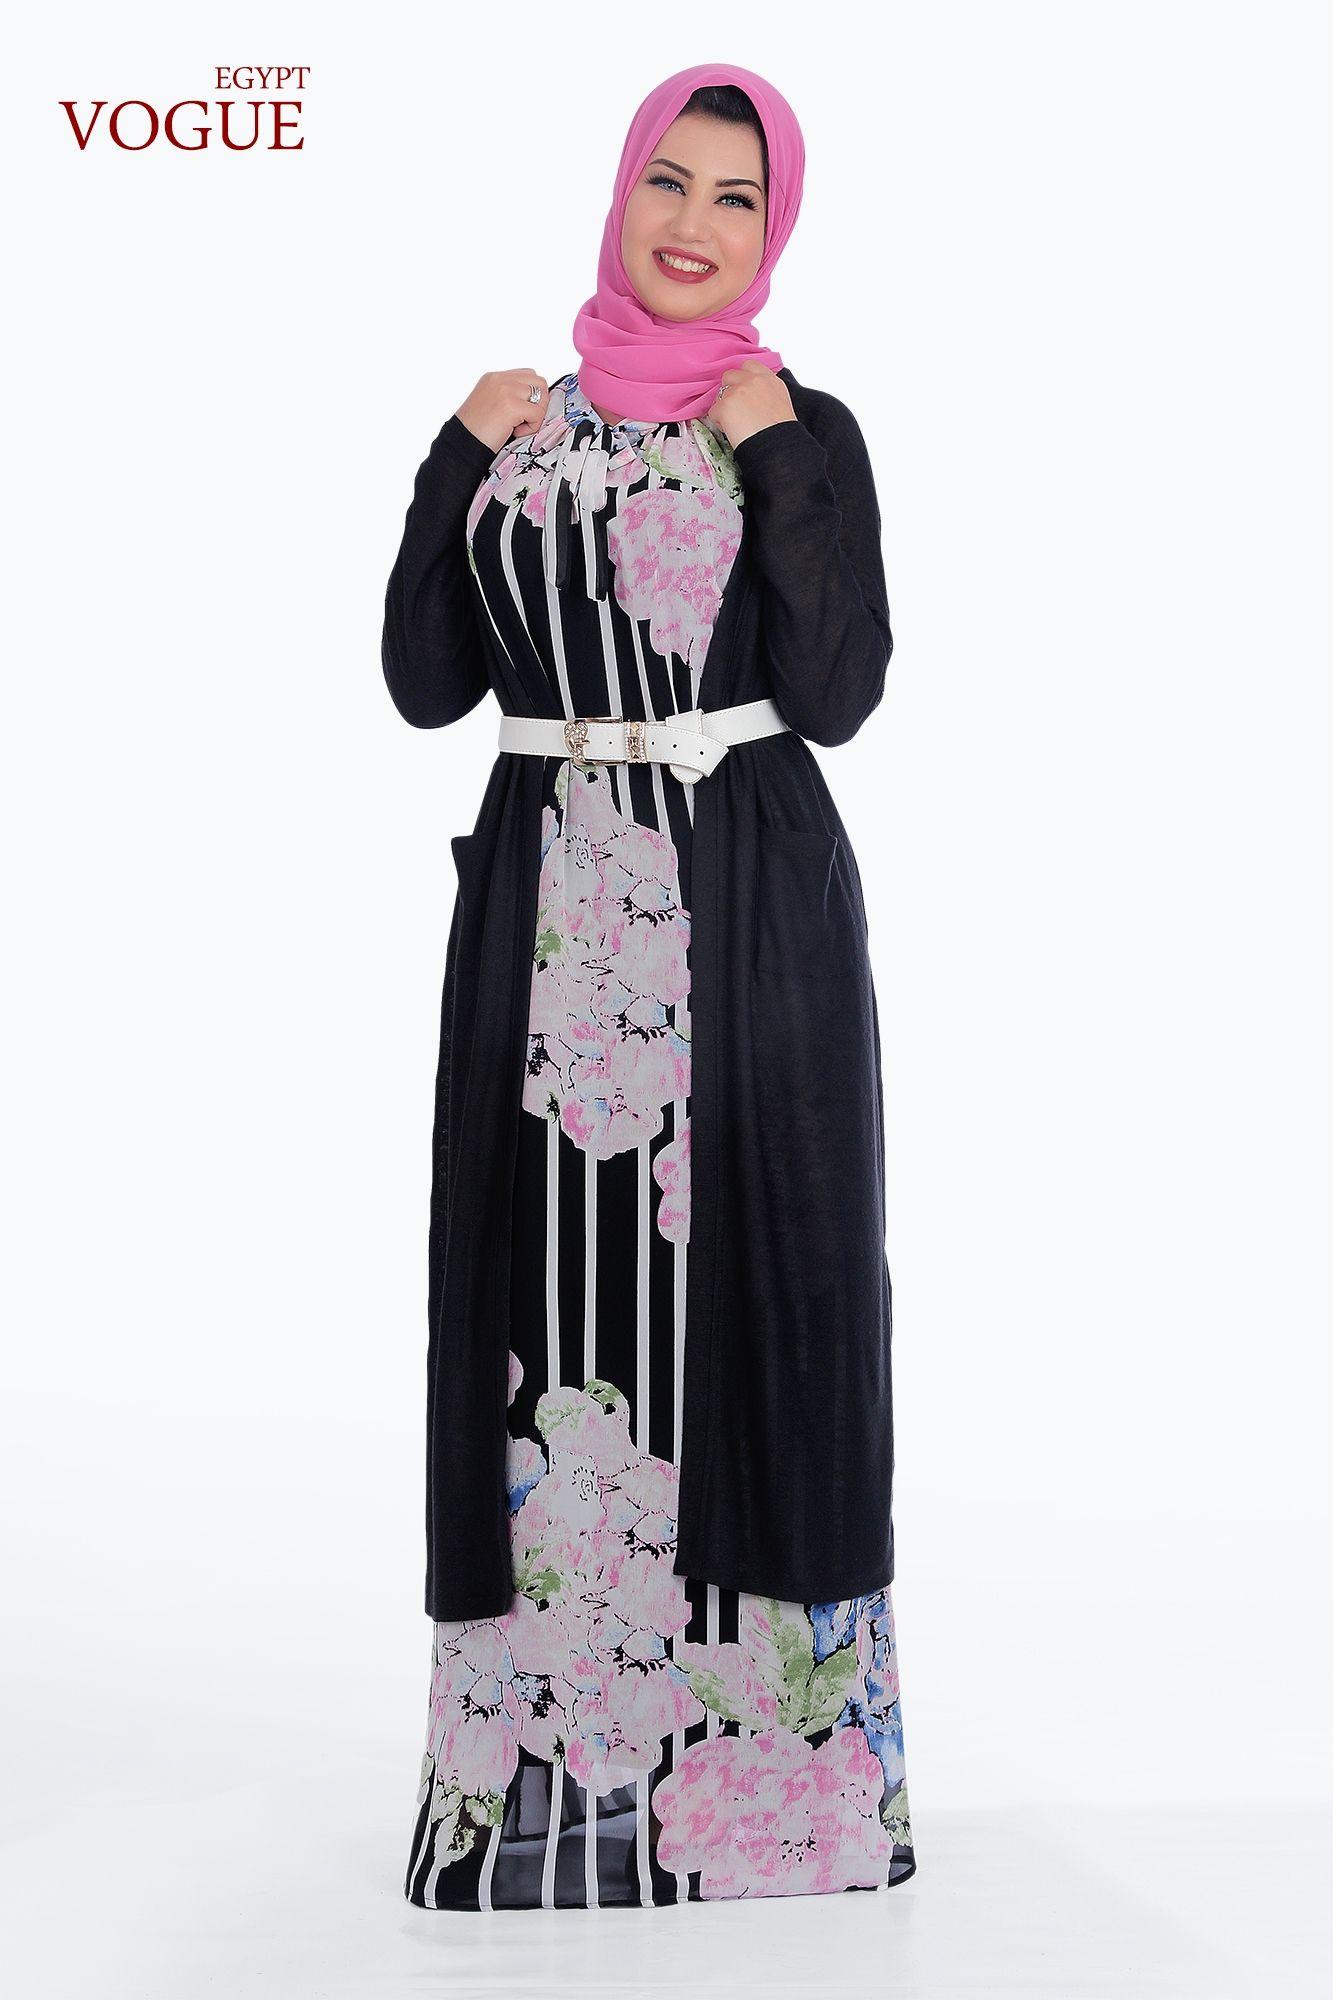 f273be485d684 سعر Vogue Egypt فستان طويل شيفون مبطن-بينك فى مصر